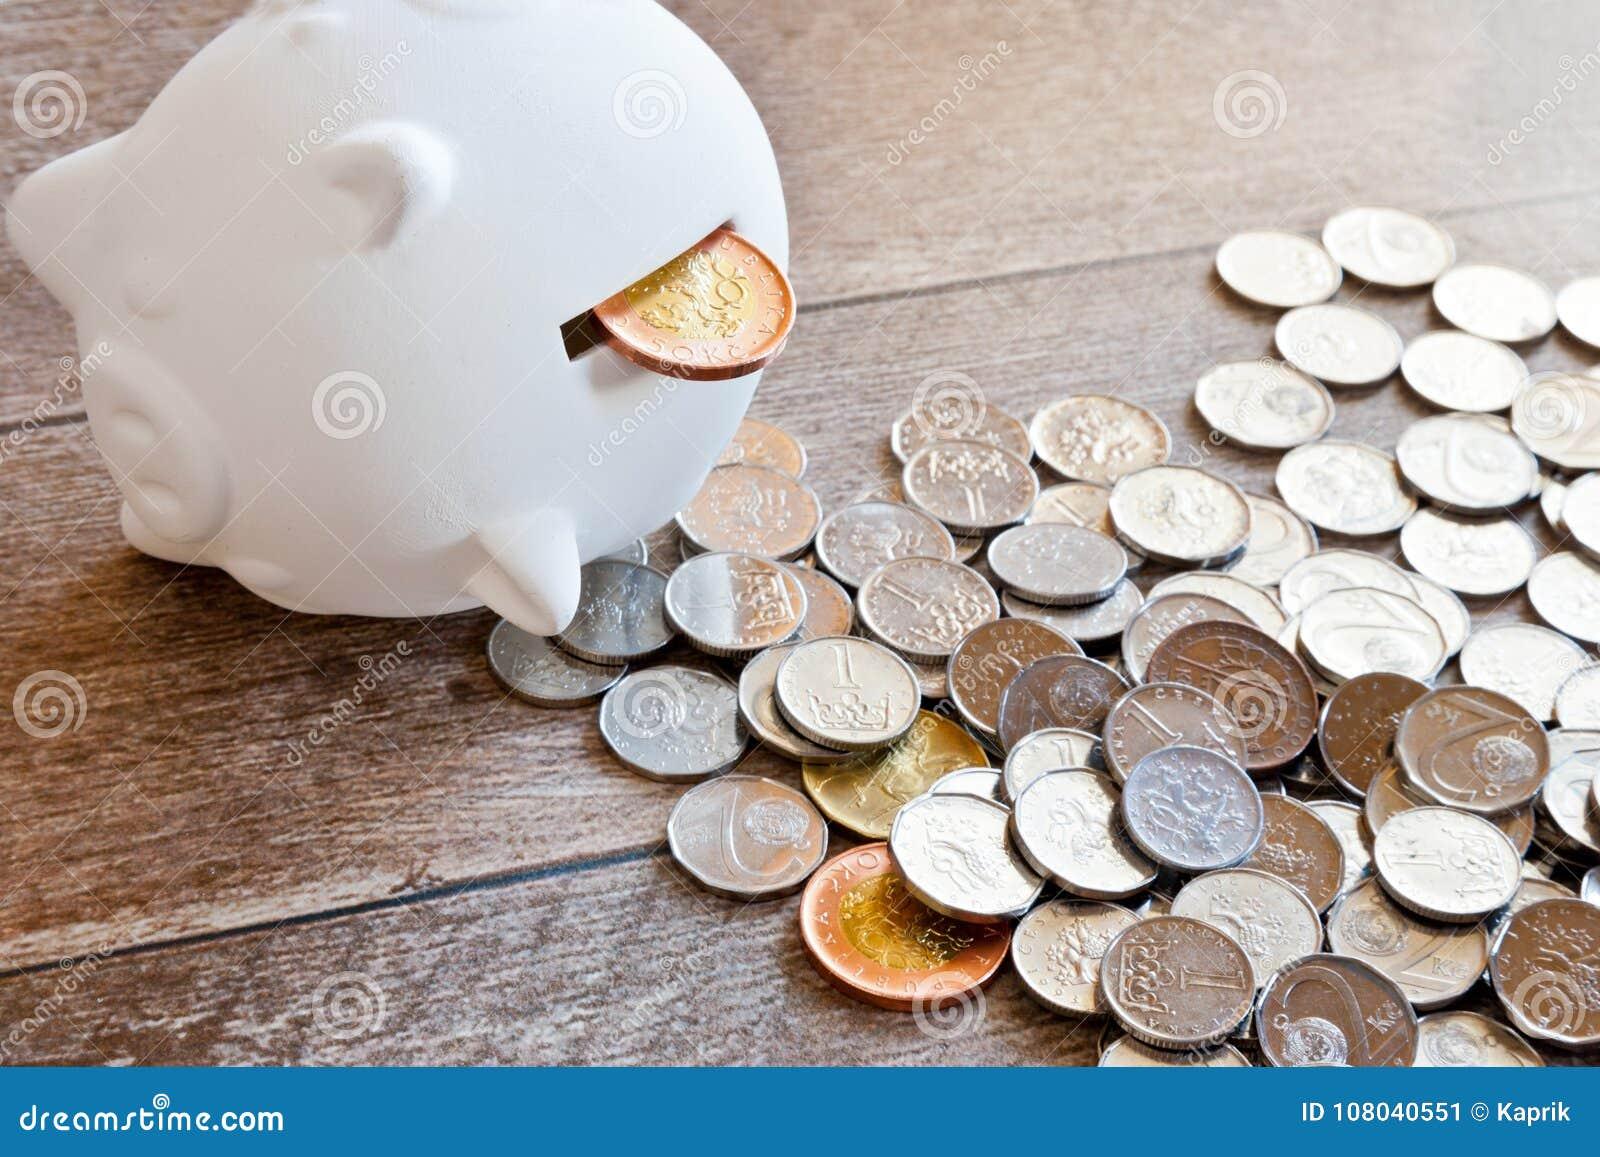 Czech finance and economy - Piggy bank and Czech crown money - c